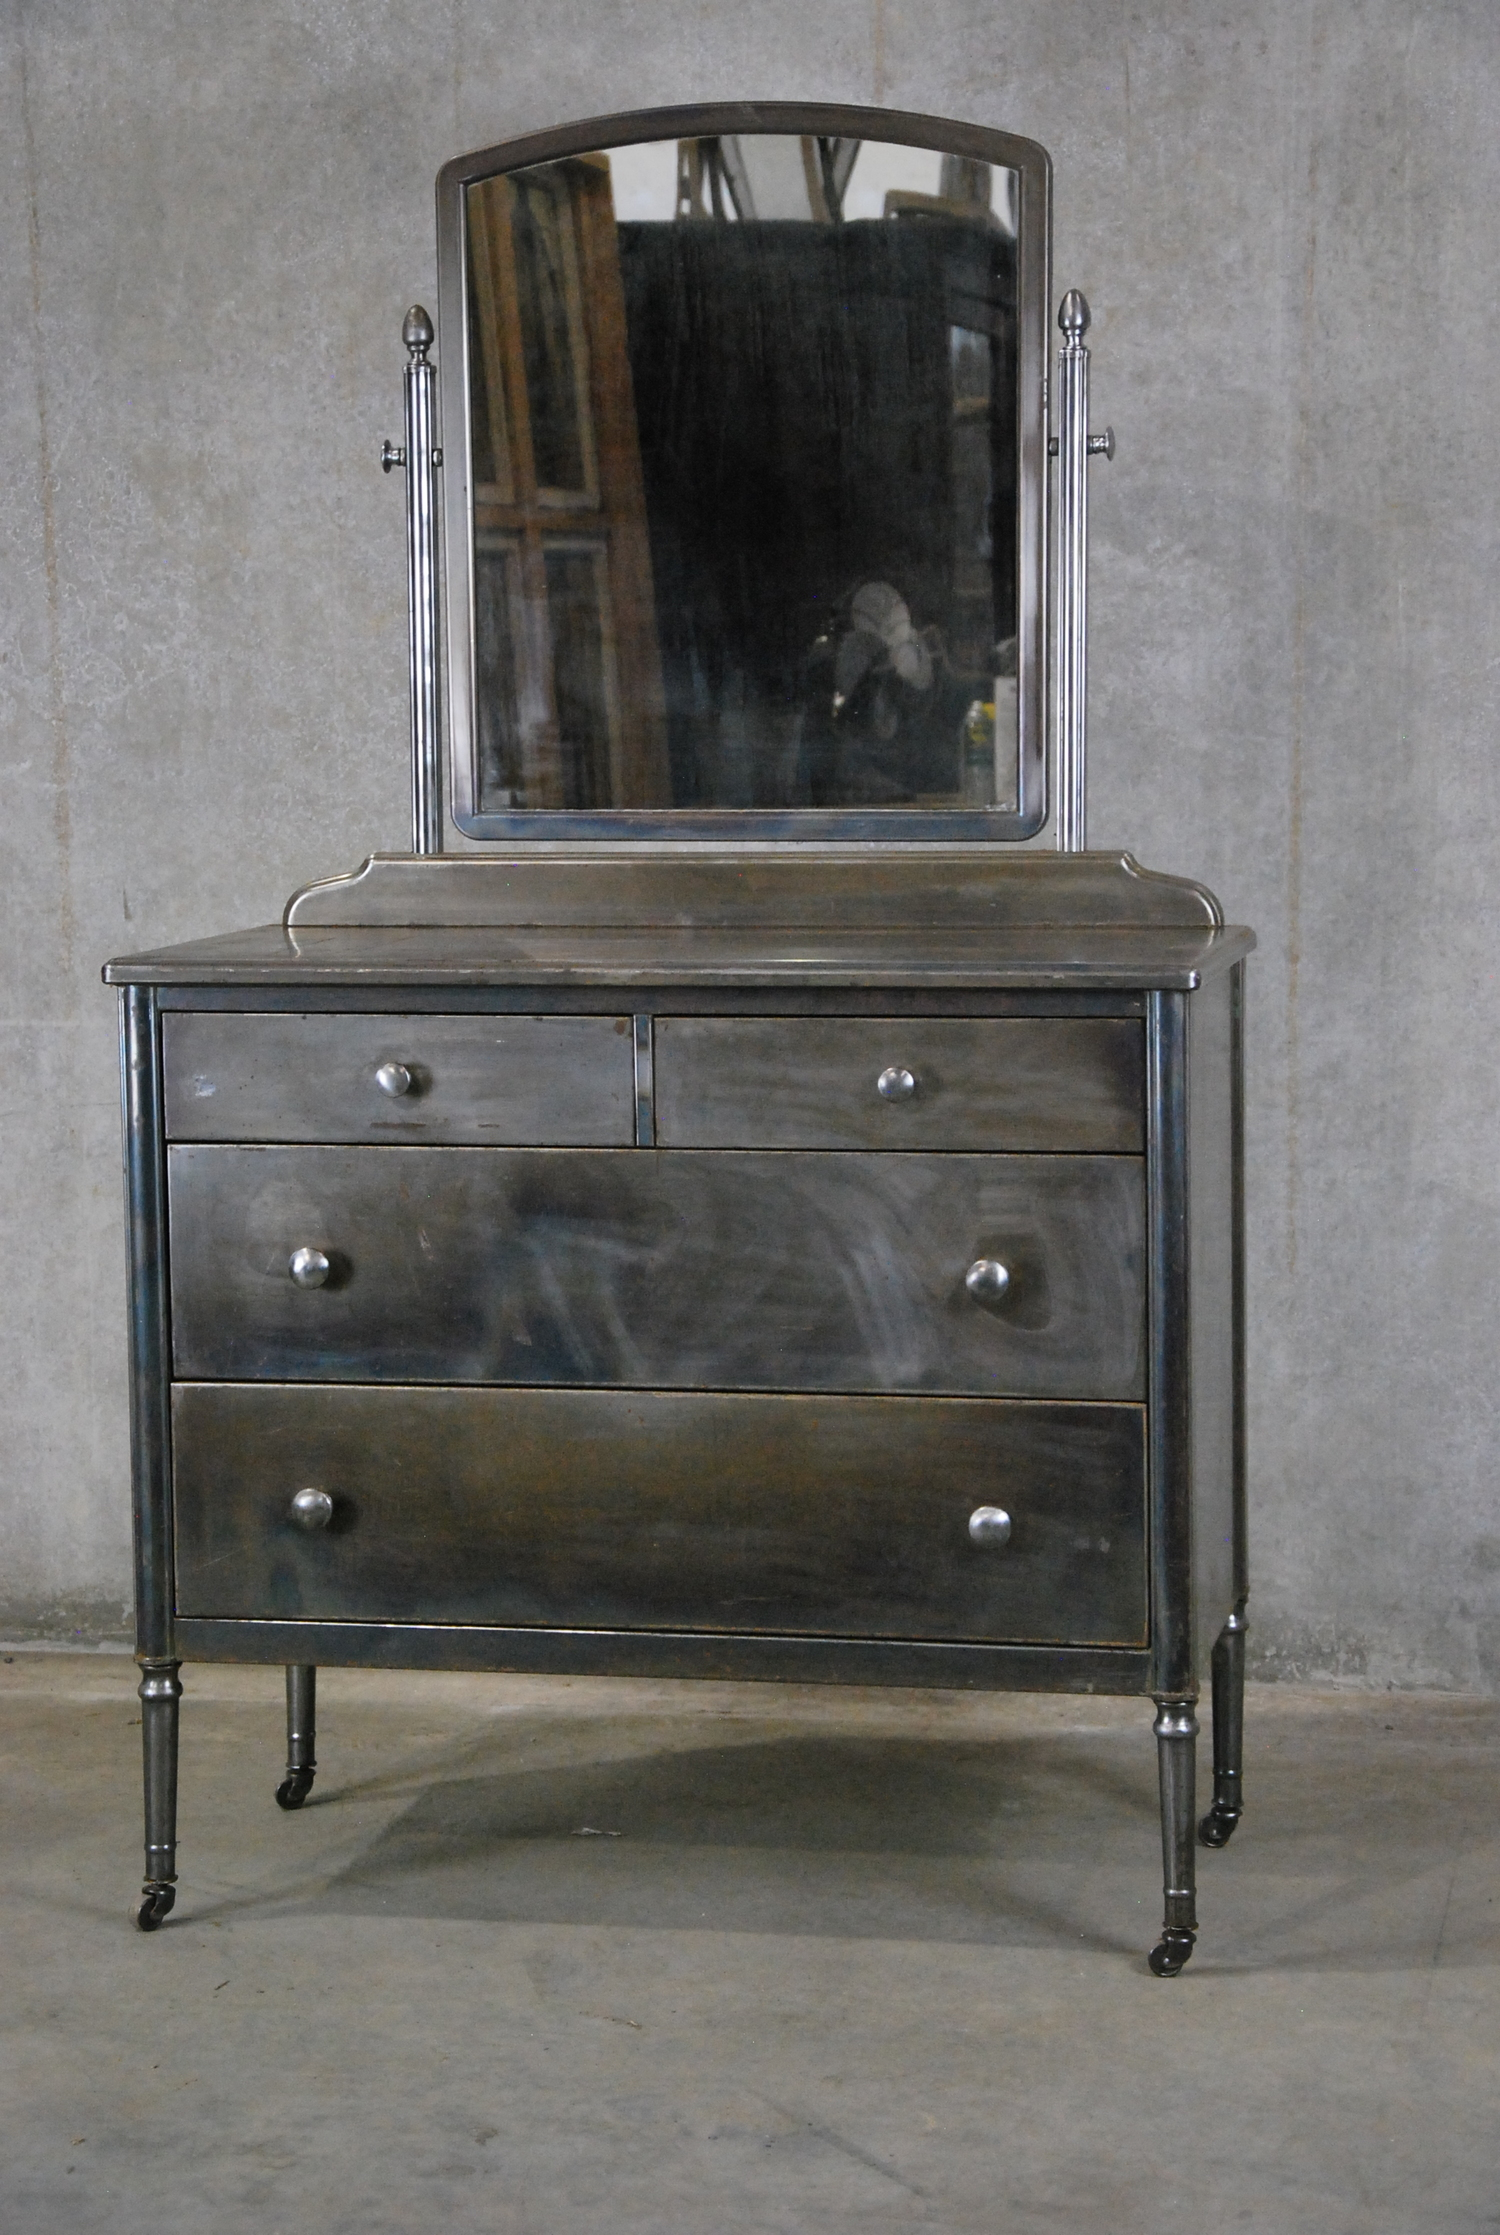 simmons metal furniture. 1930 Simmons Metal Industrial Dresser Furniture T